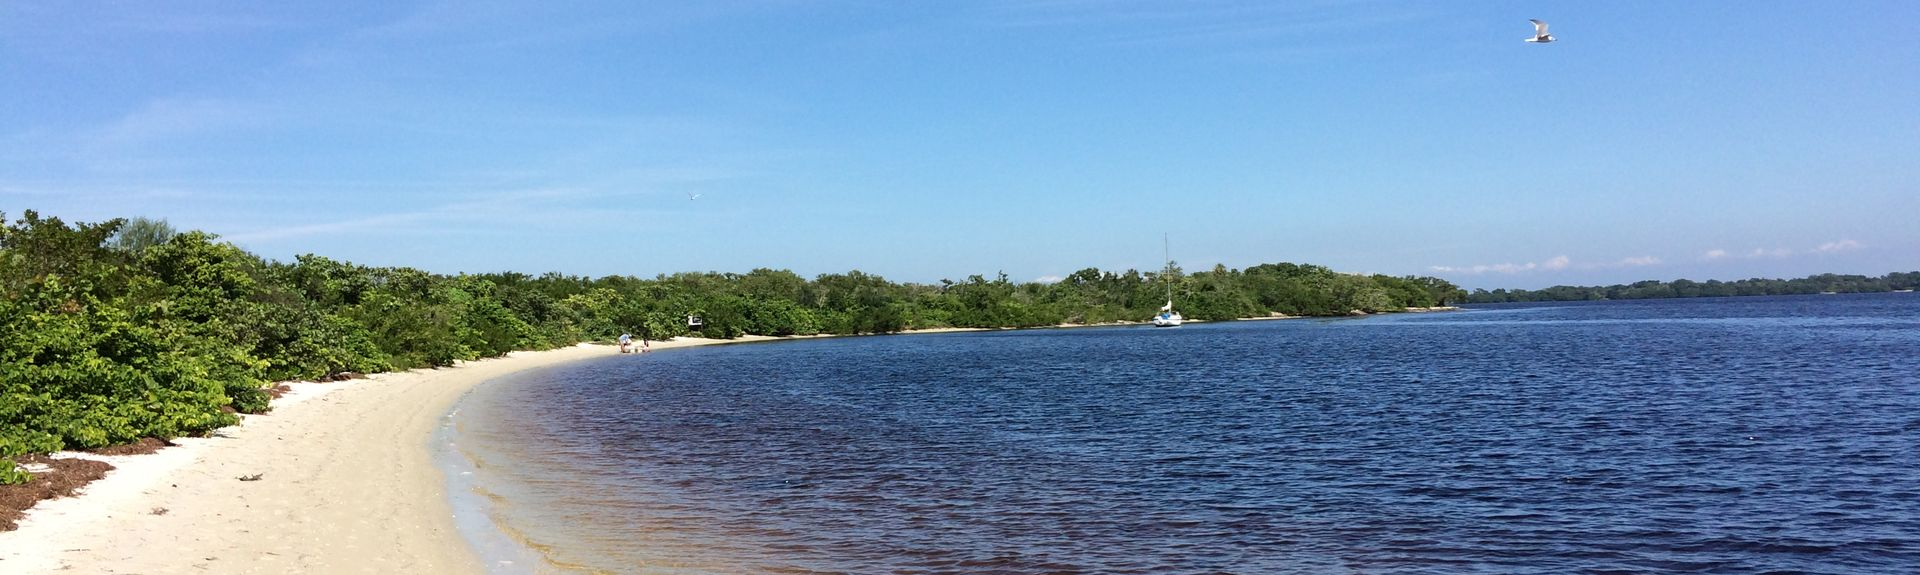 Shorewalk Vacation Villas, Bradenton, FL, USA